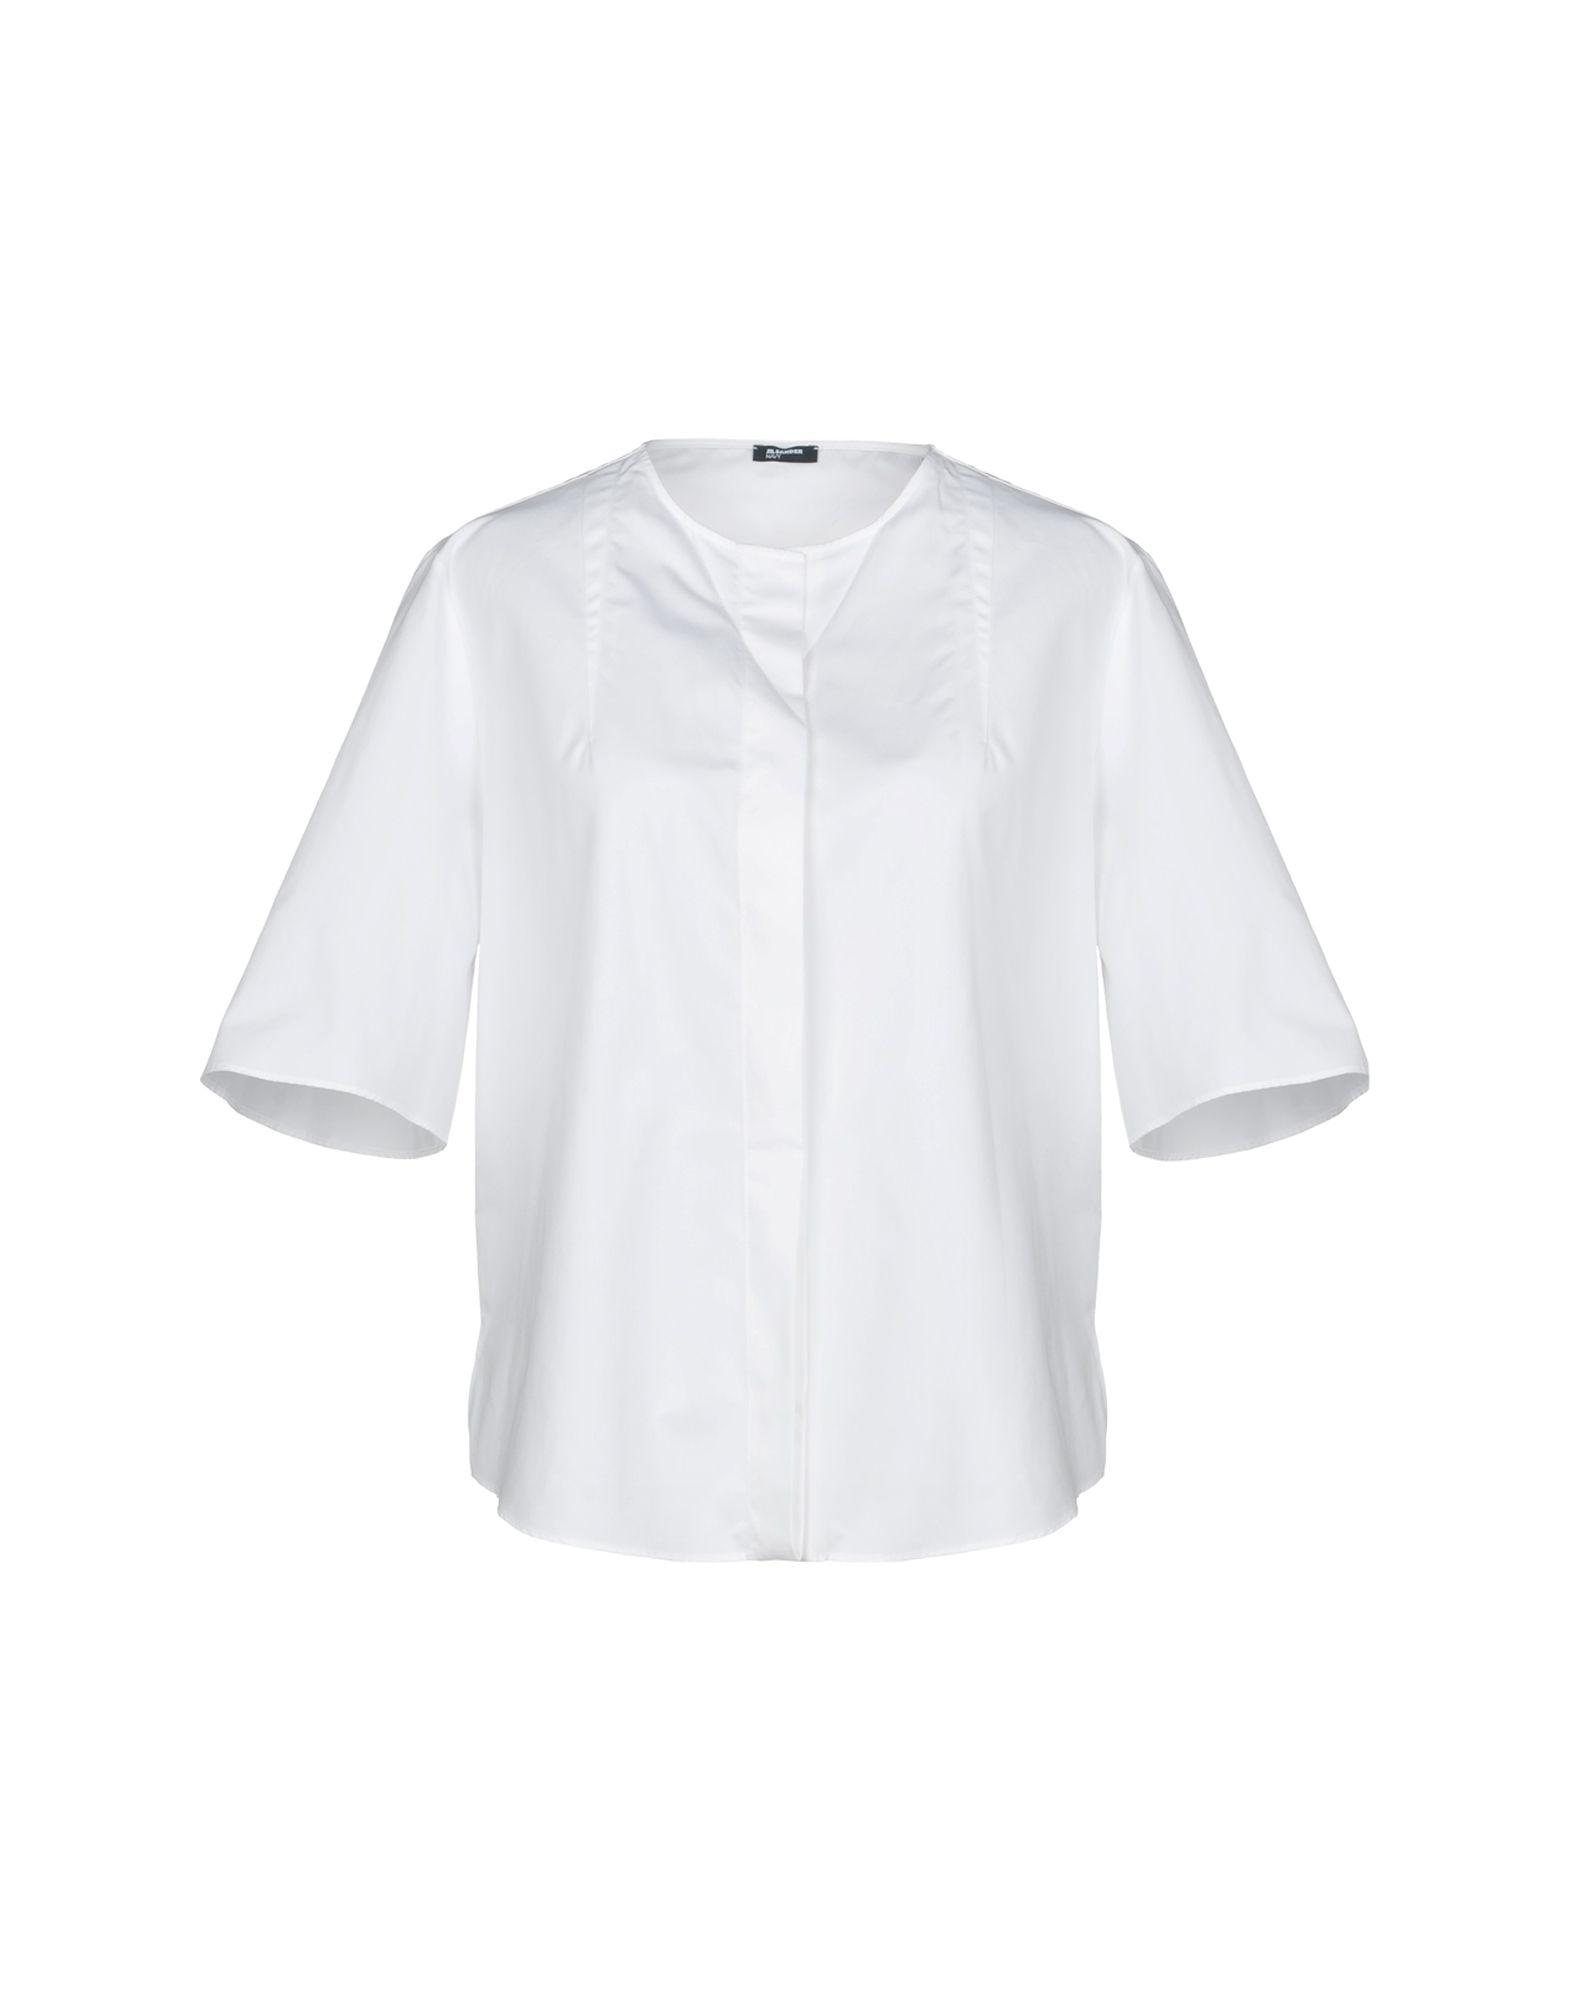 JIL SANDER NAVY Pубашка перчатки eleganzza is01433 navy